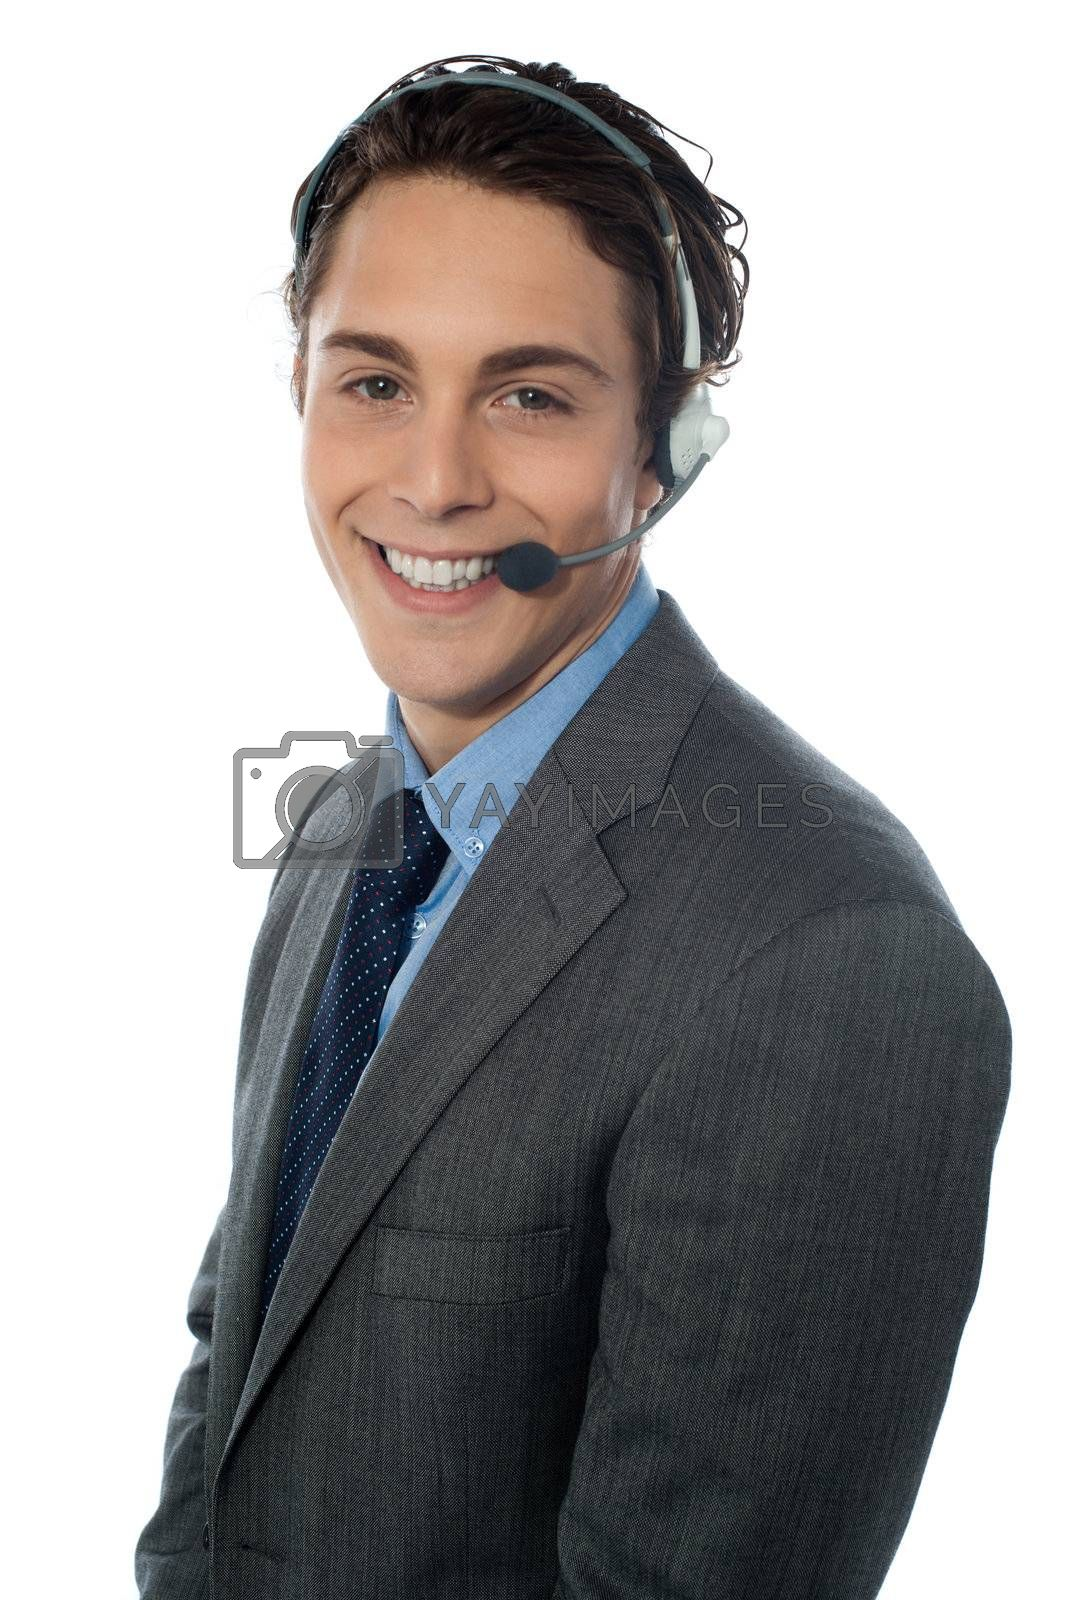 Male customer service representative smiling, isolated on white